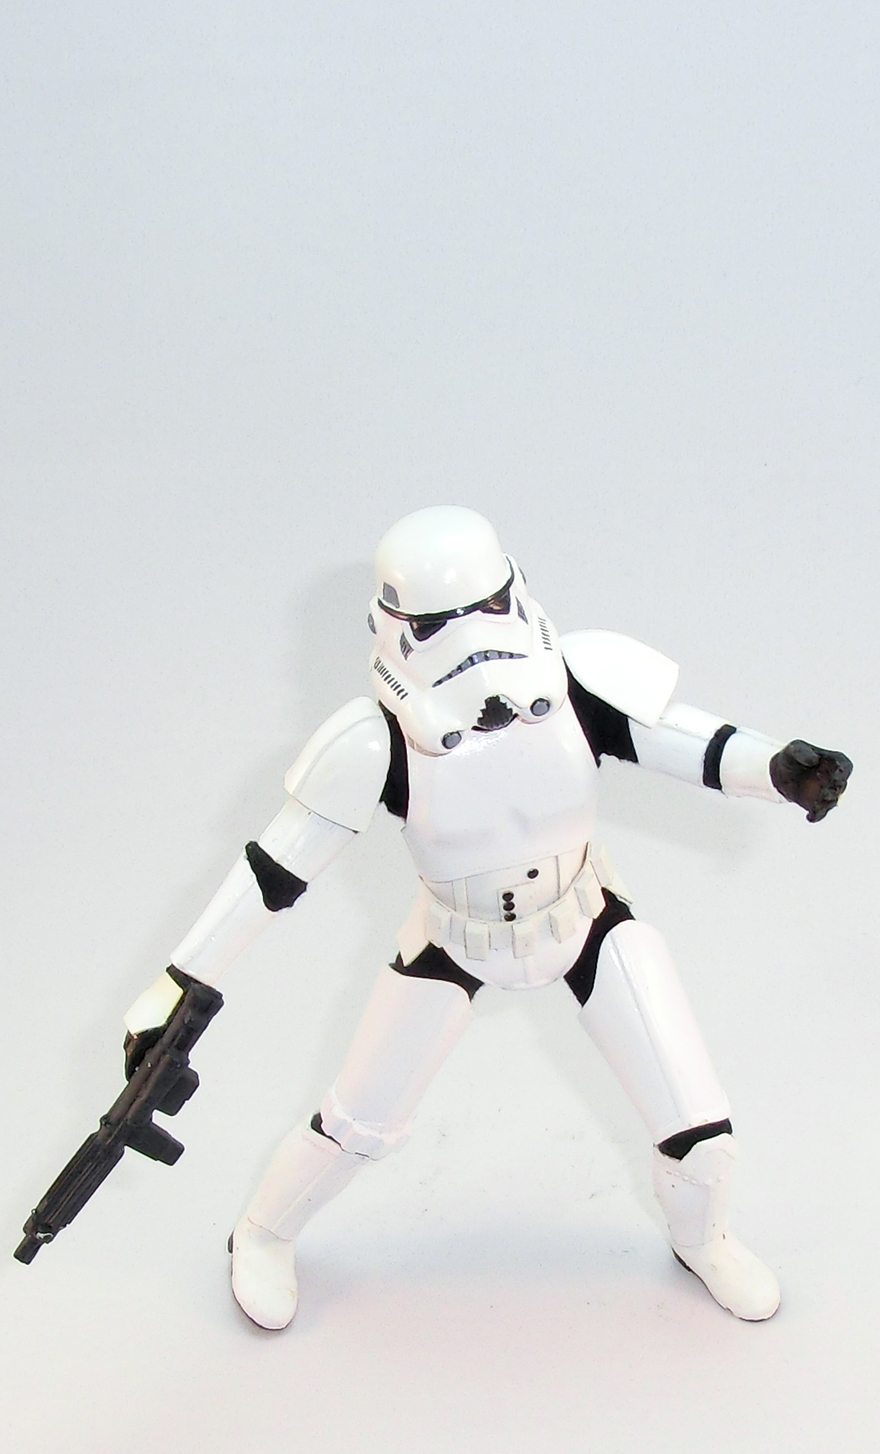 madelman-stormtrooper-star-wars-01